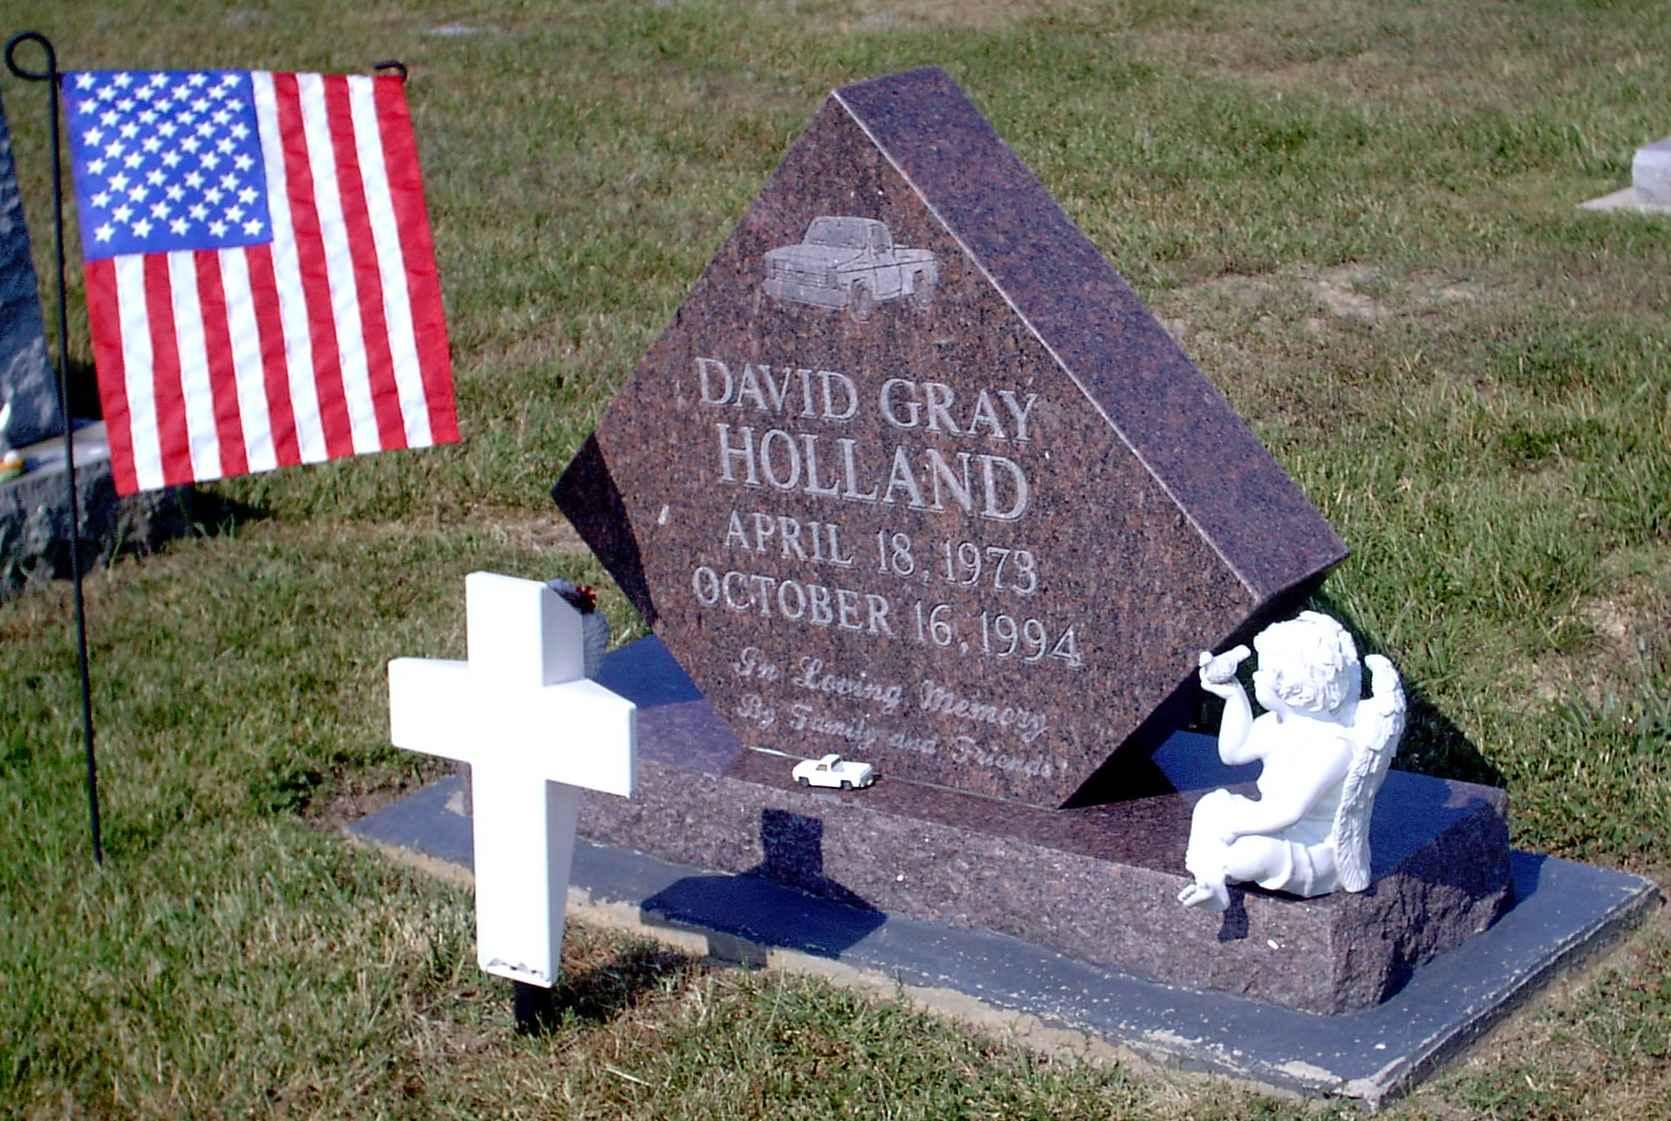 David Gray Holland